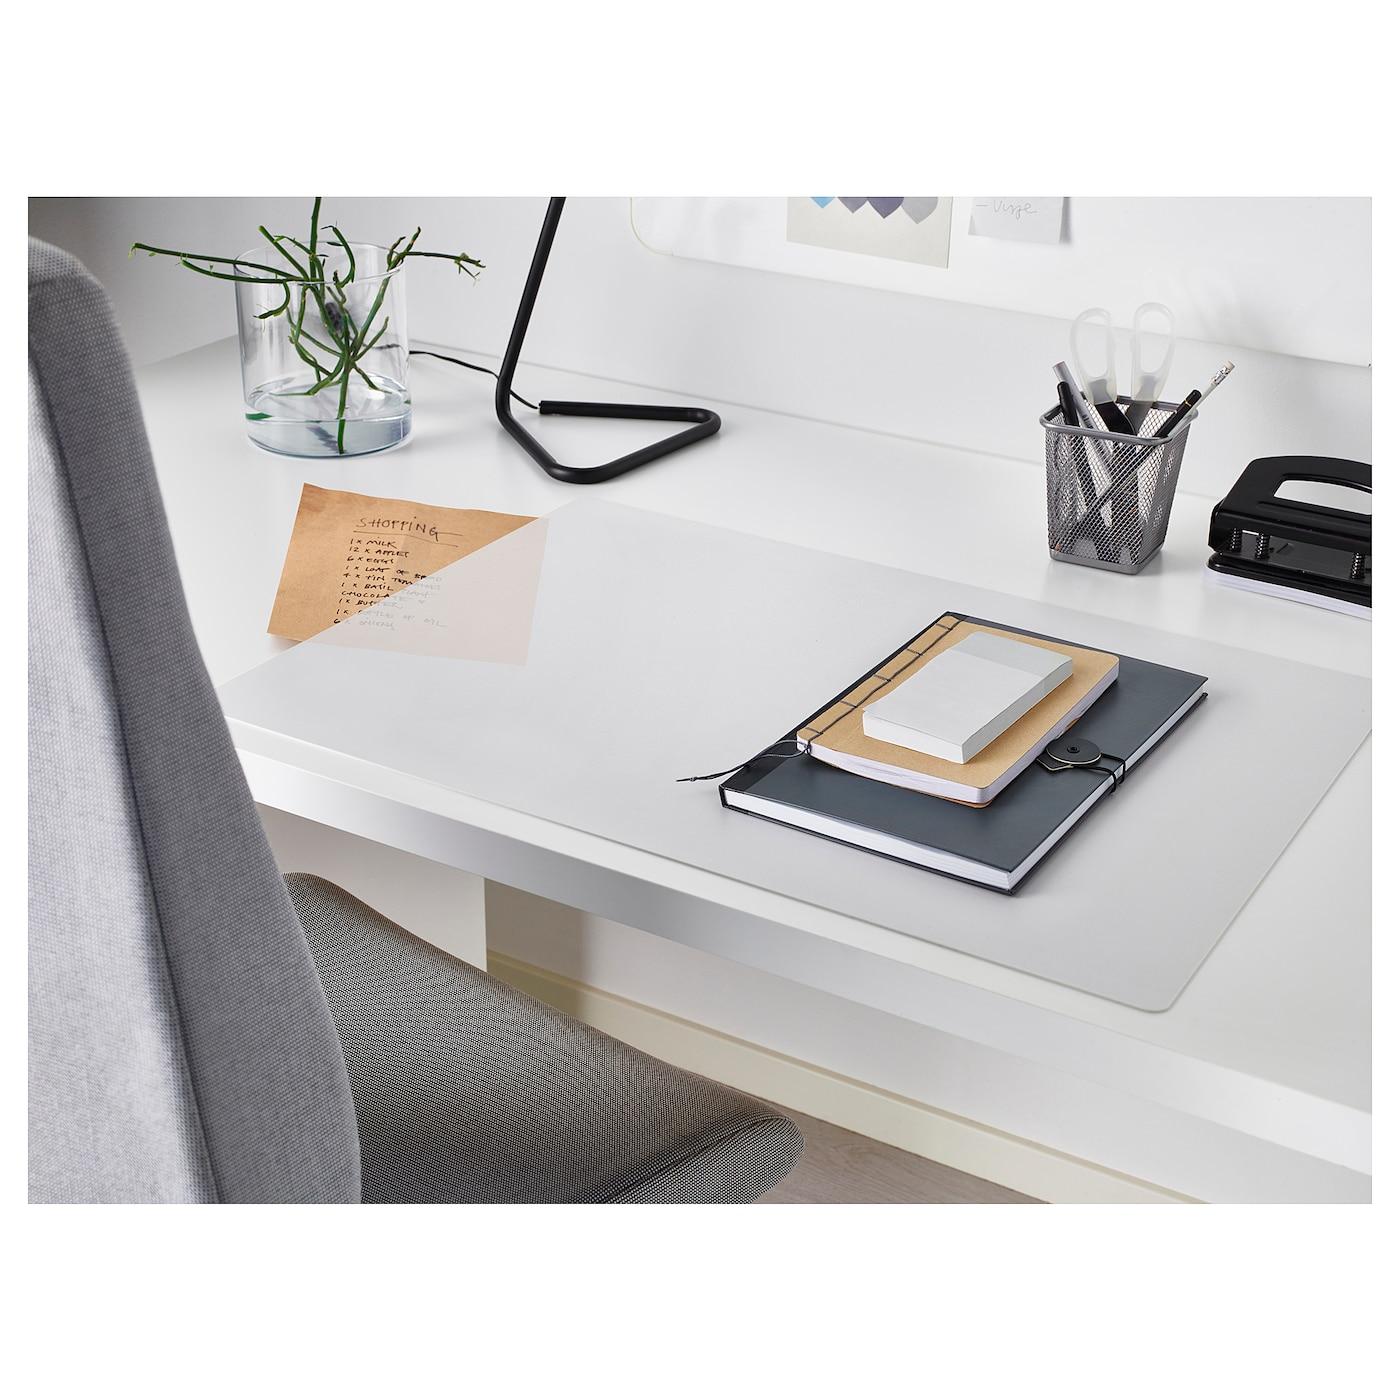 SKVALLRA لبادة مكتب, أبيض/شفاف, 38x58 سم